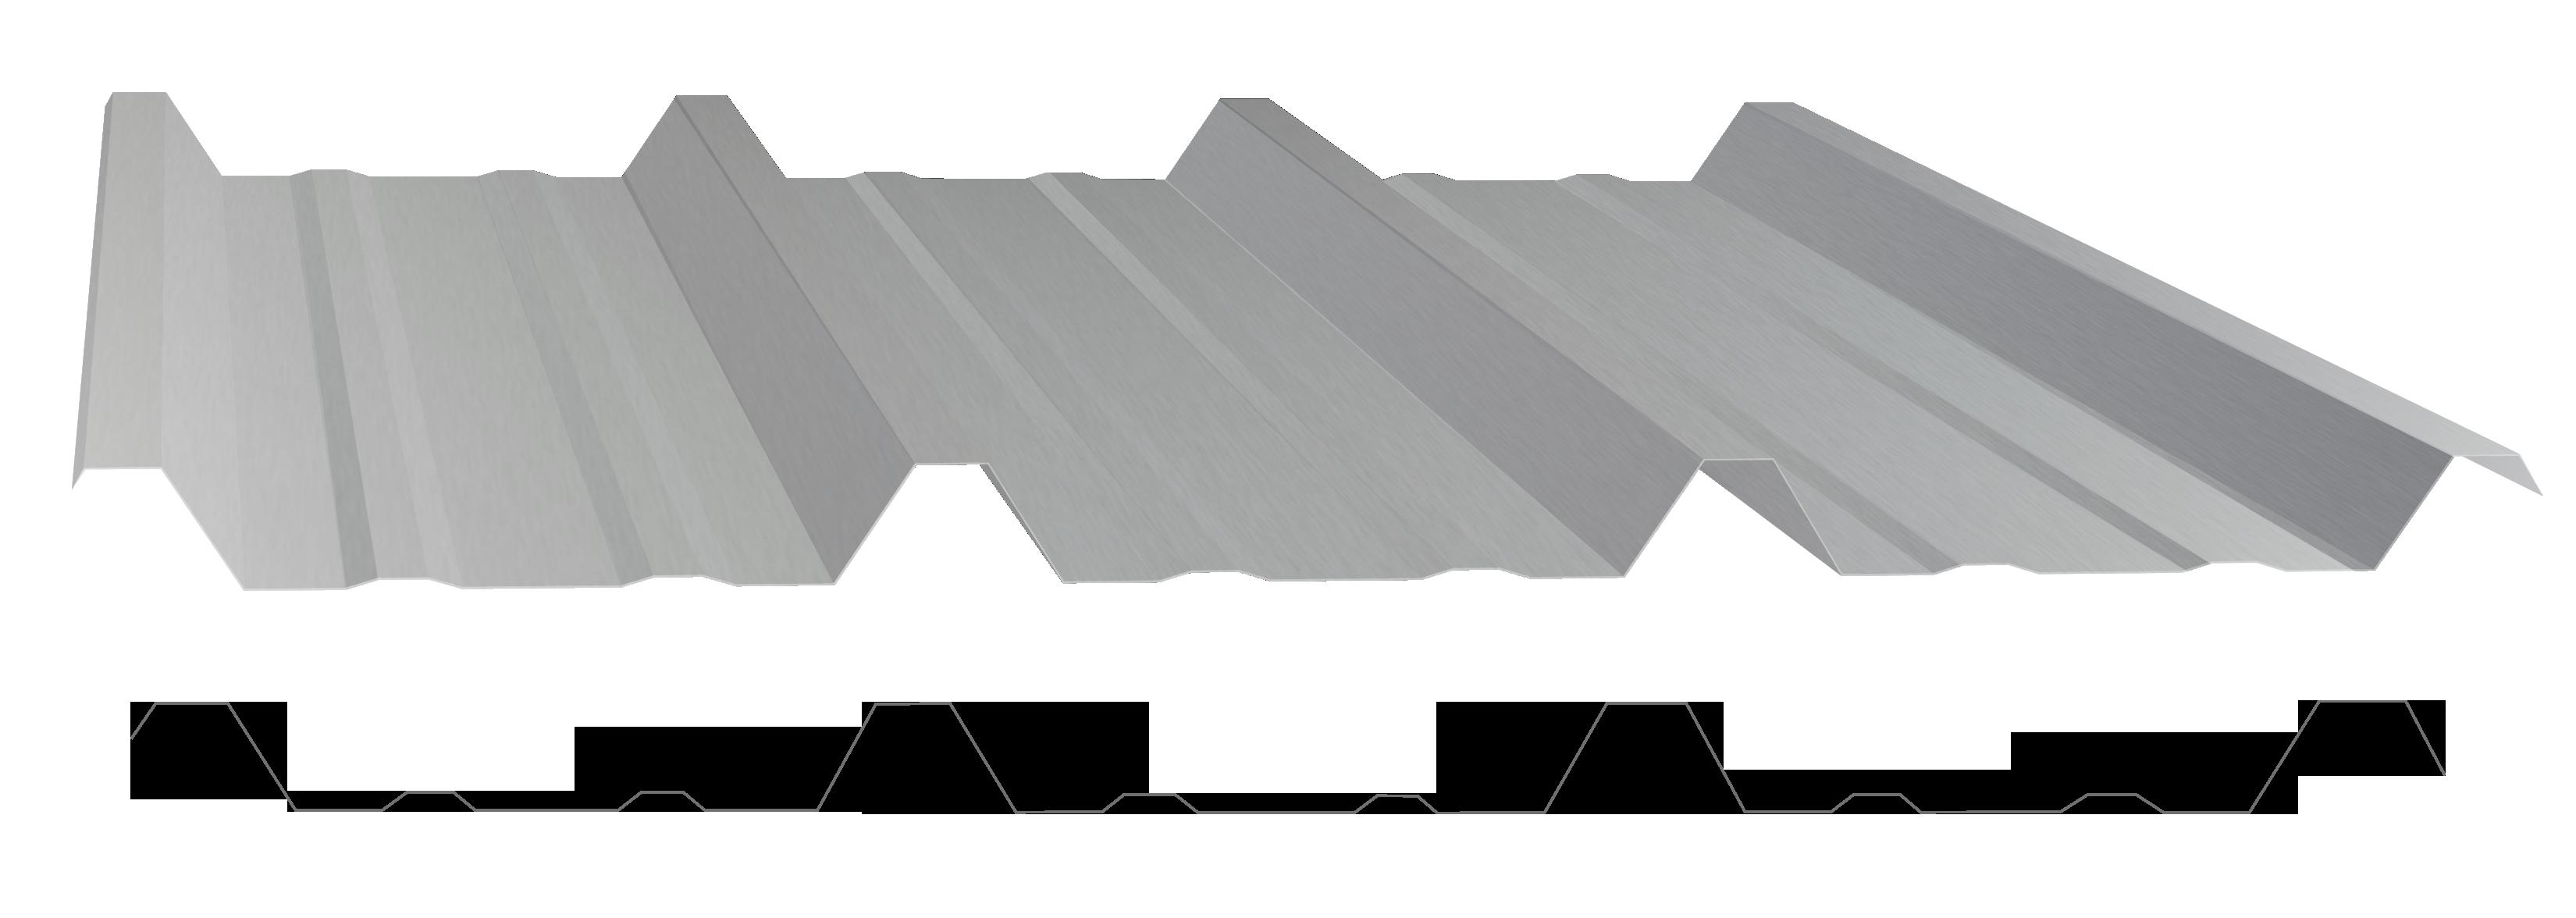 imagen panel aislado polchile